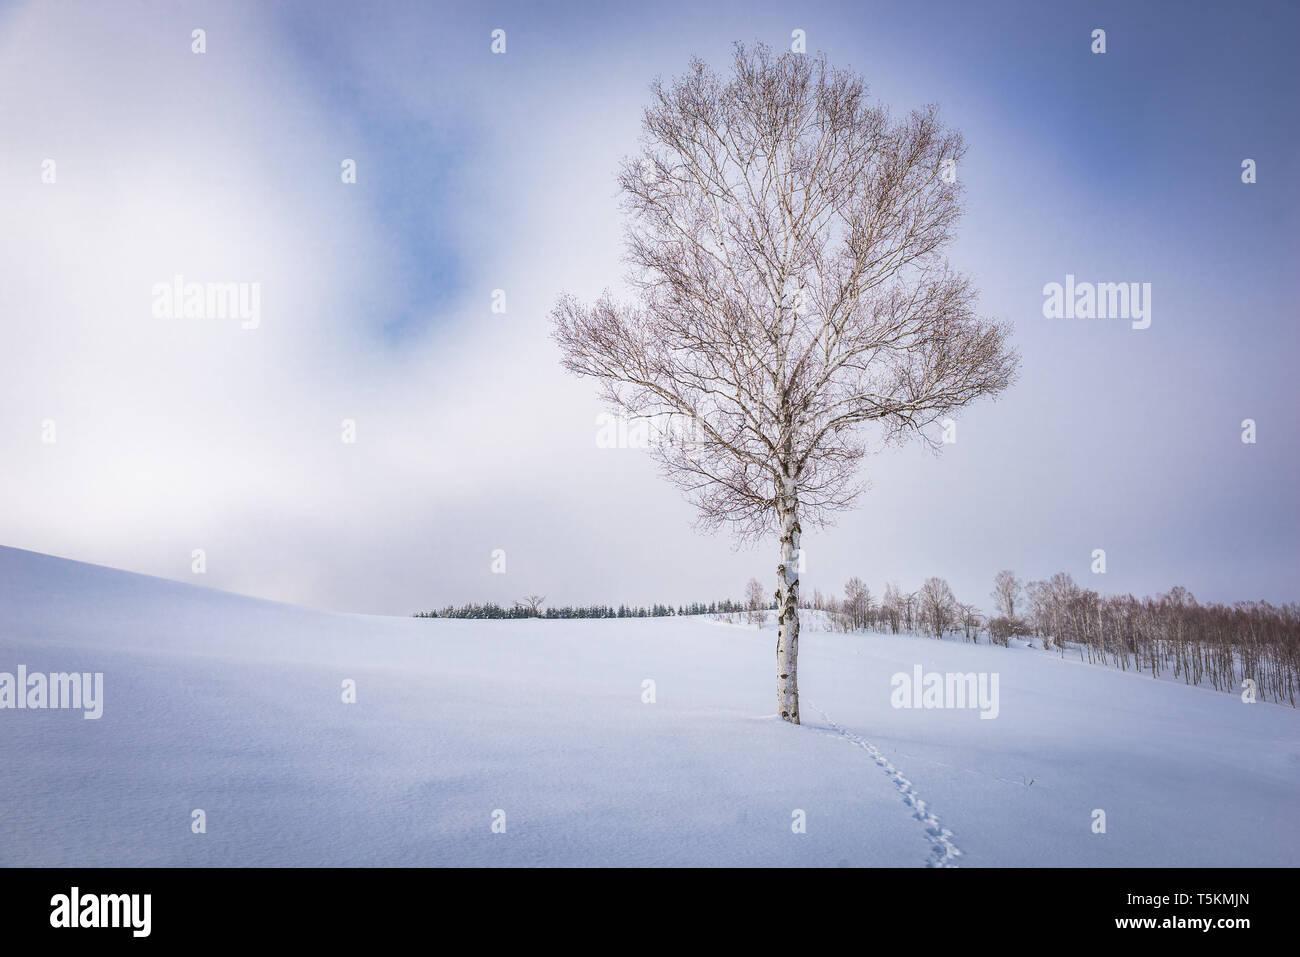 Biei, Japan in winter on Panorama Road. - Stock Image